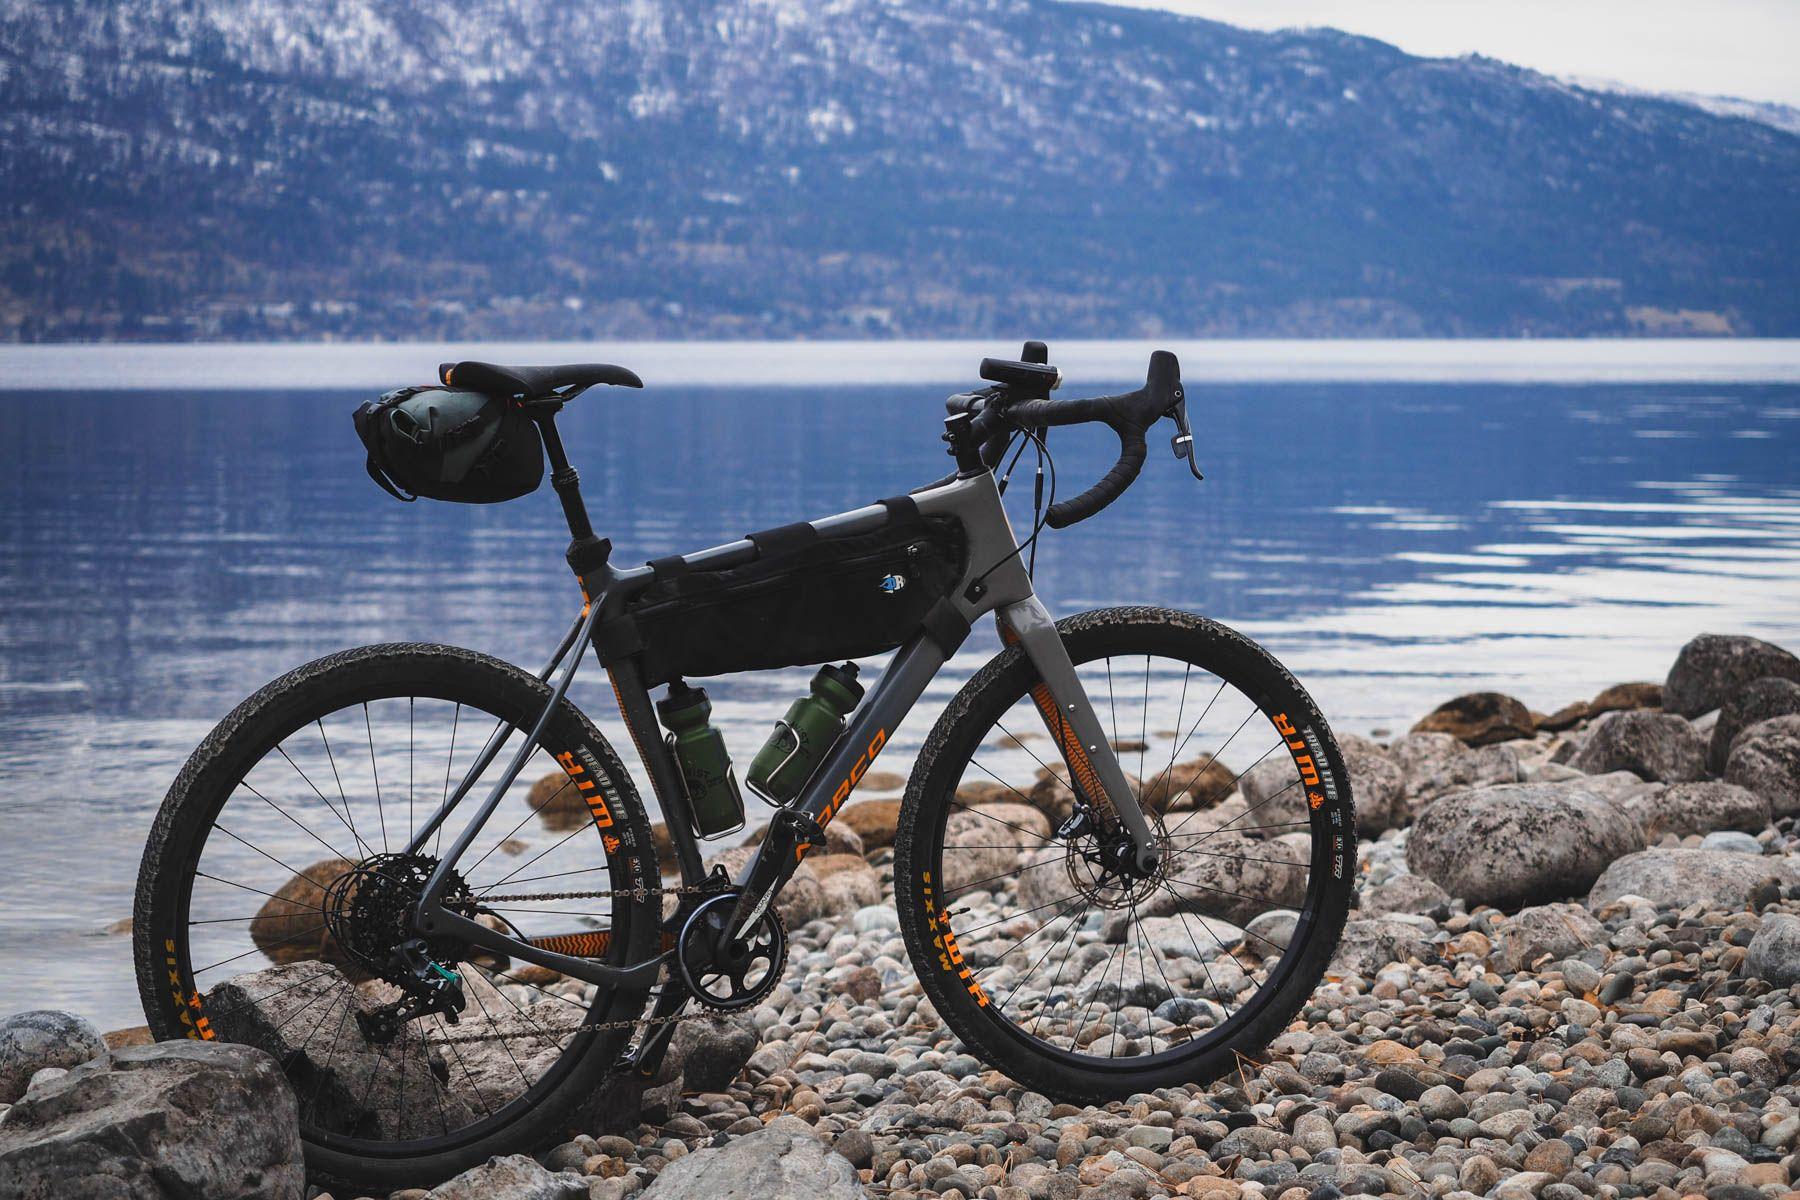 Pnw Components Bachelor 150 Dropper Post Review Bike Parts